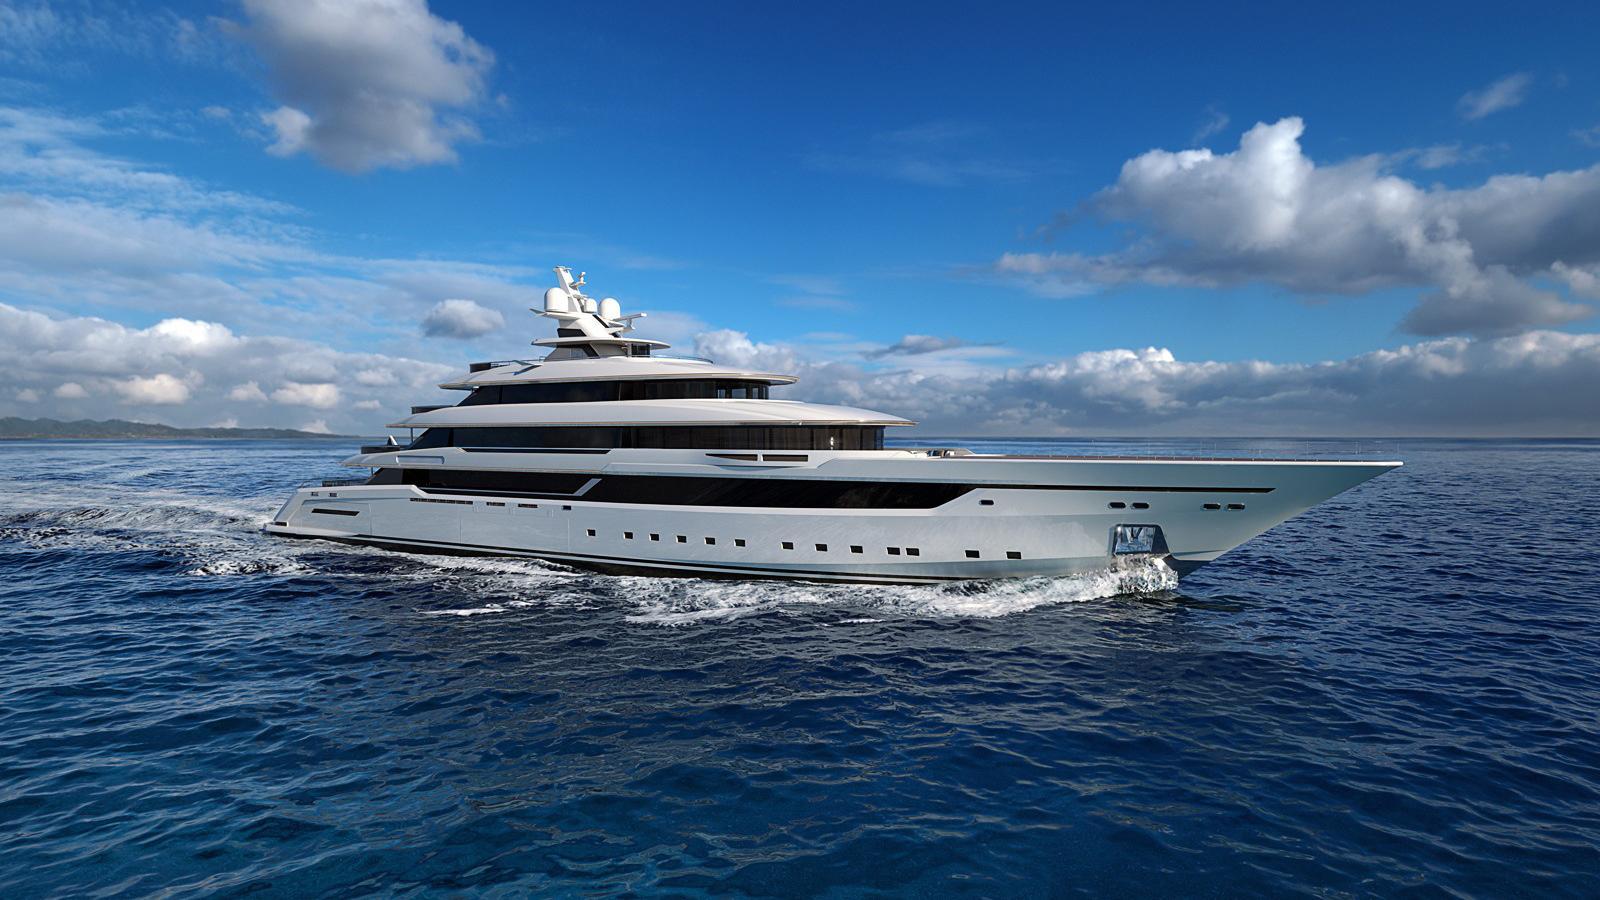 columbus classic 80m motoryacht palumbo 80m 2018 rendering half profile